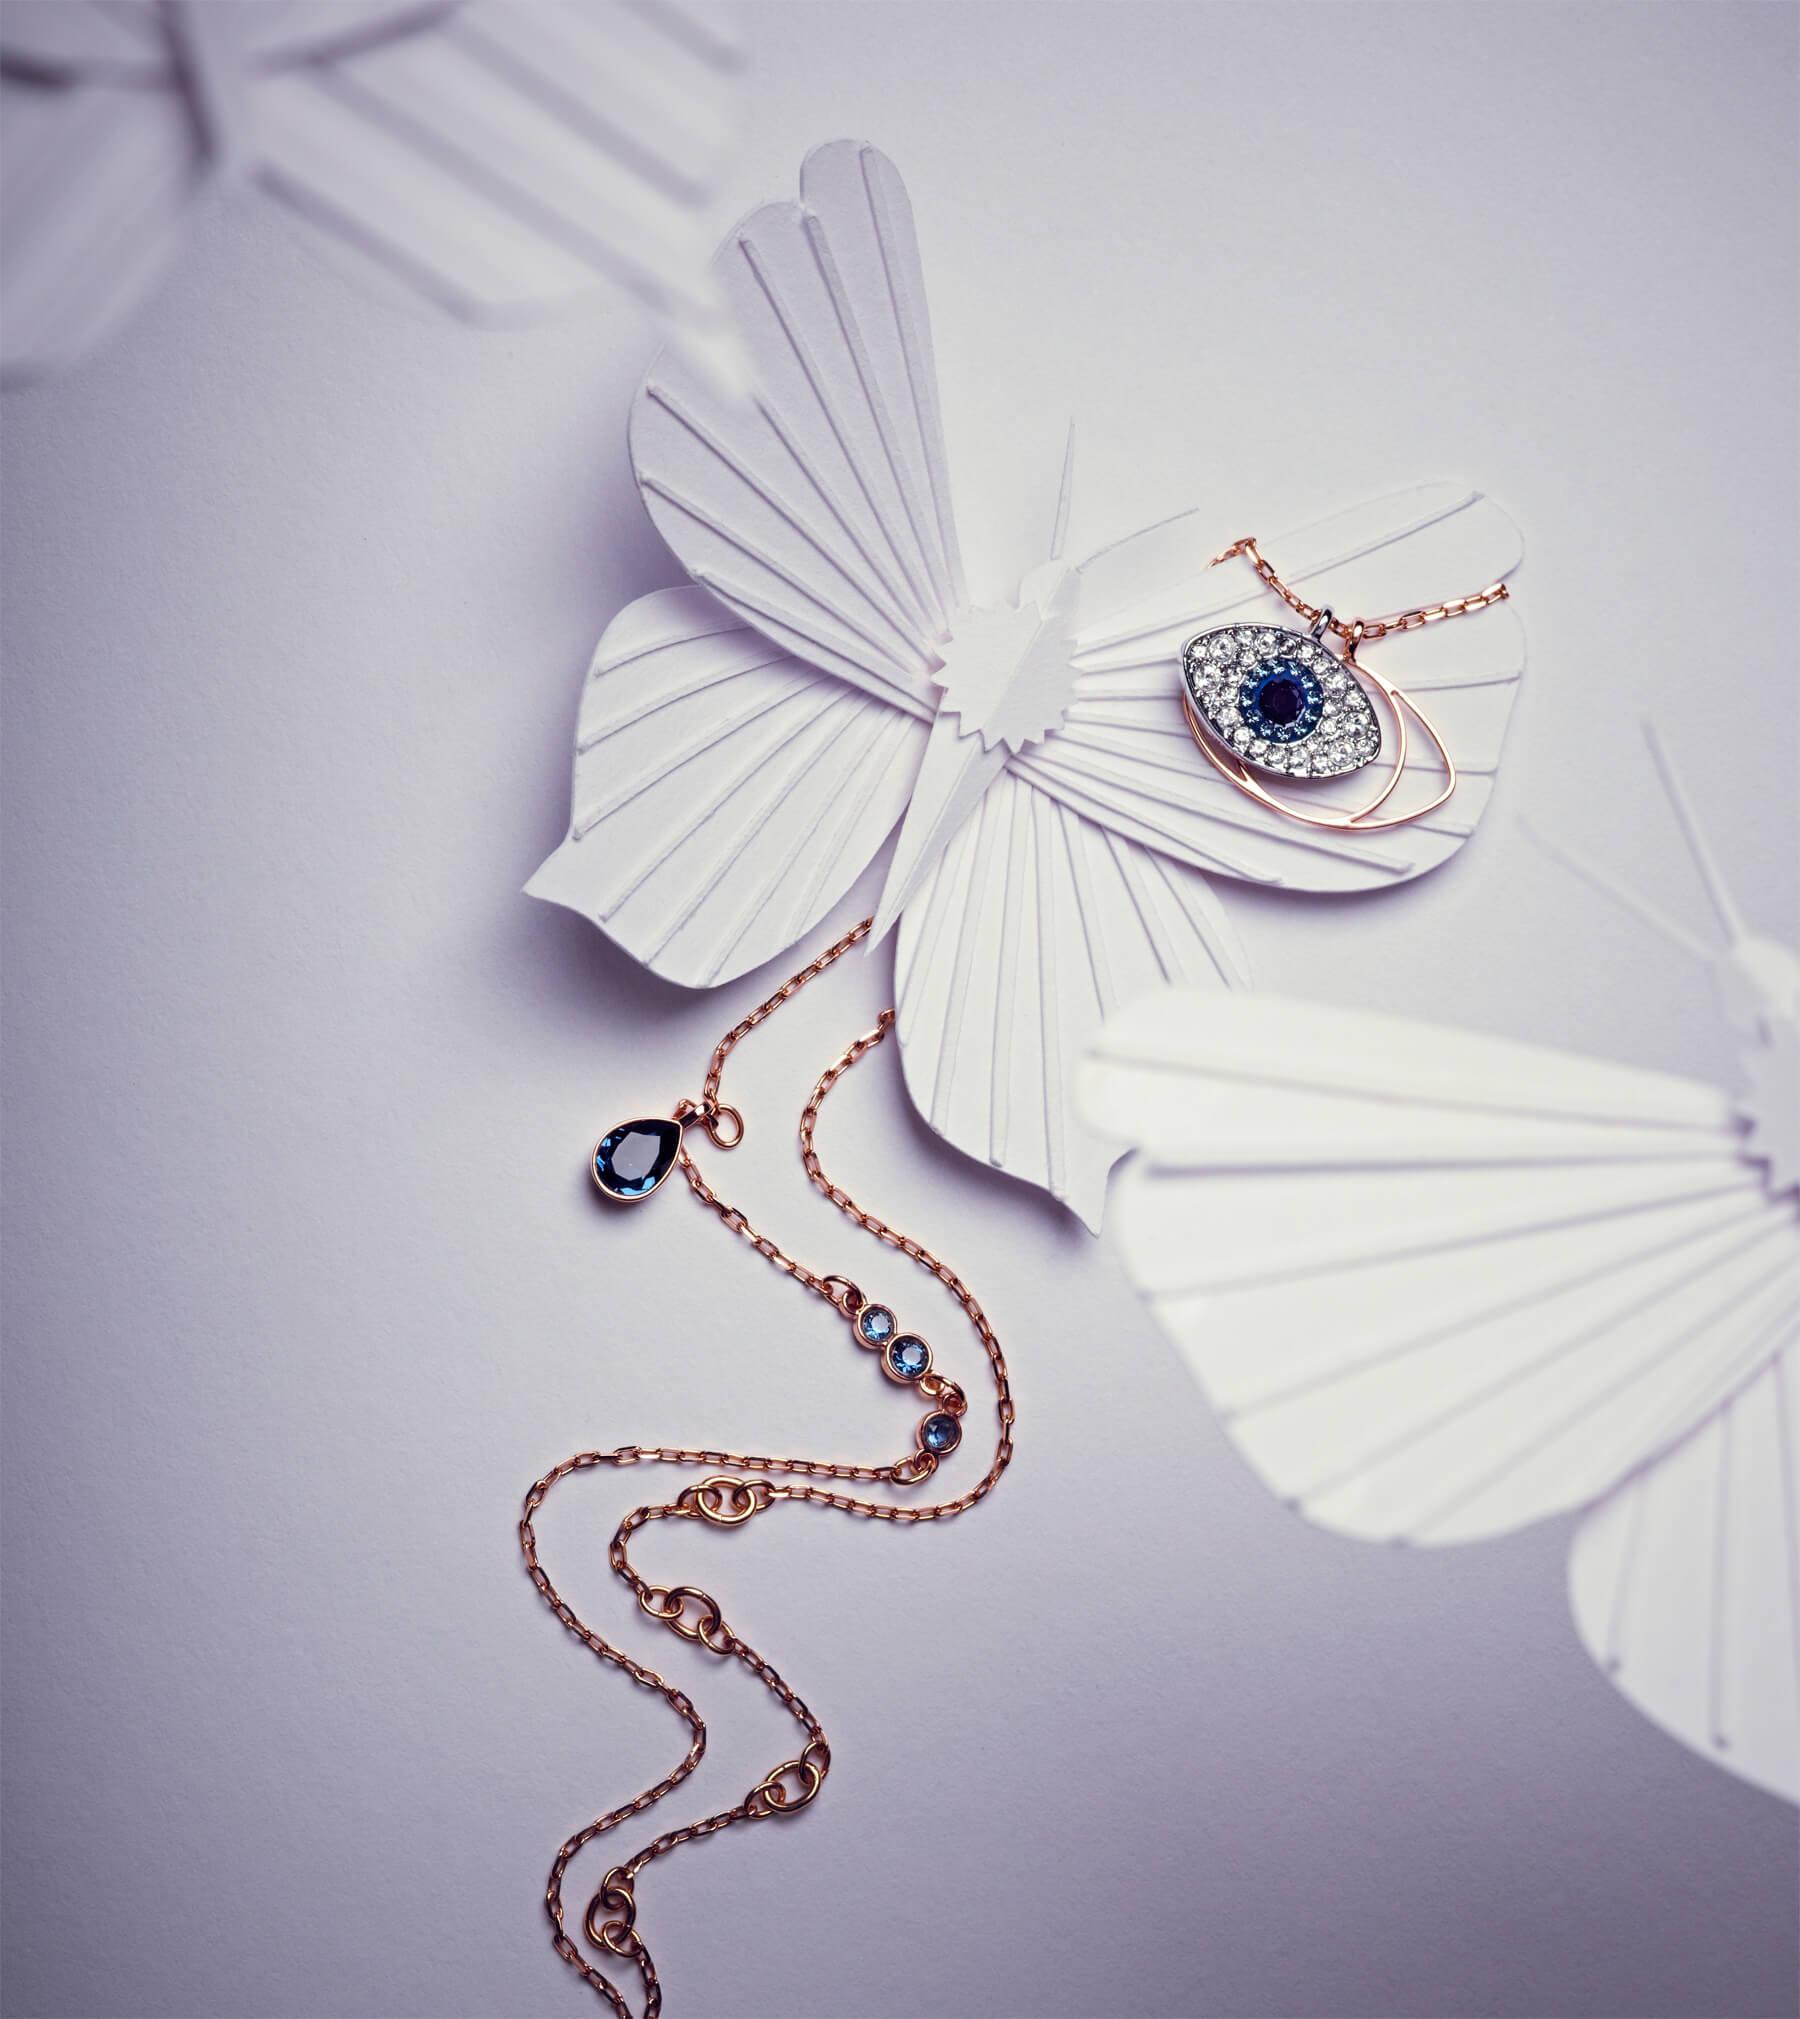 barbara_paperart_butterfly1_katrinrodegast_web